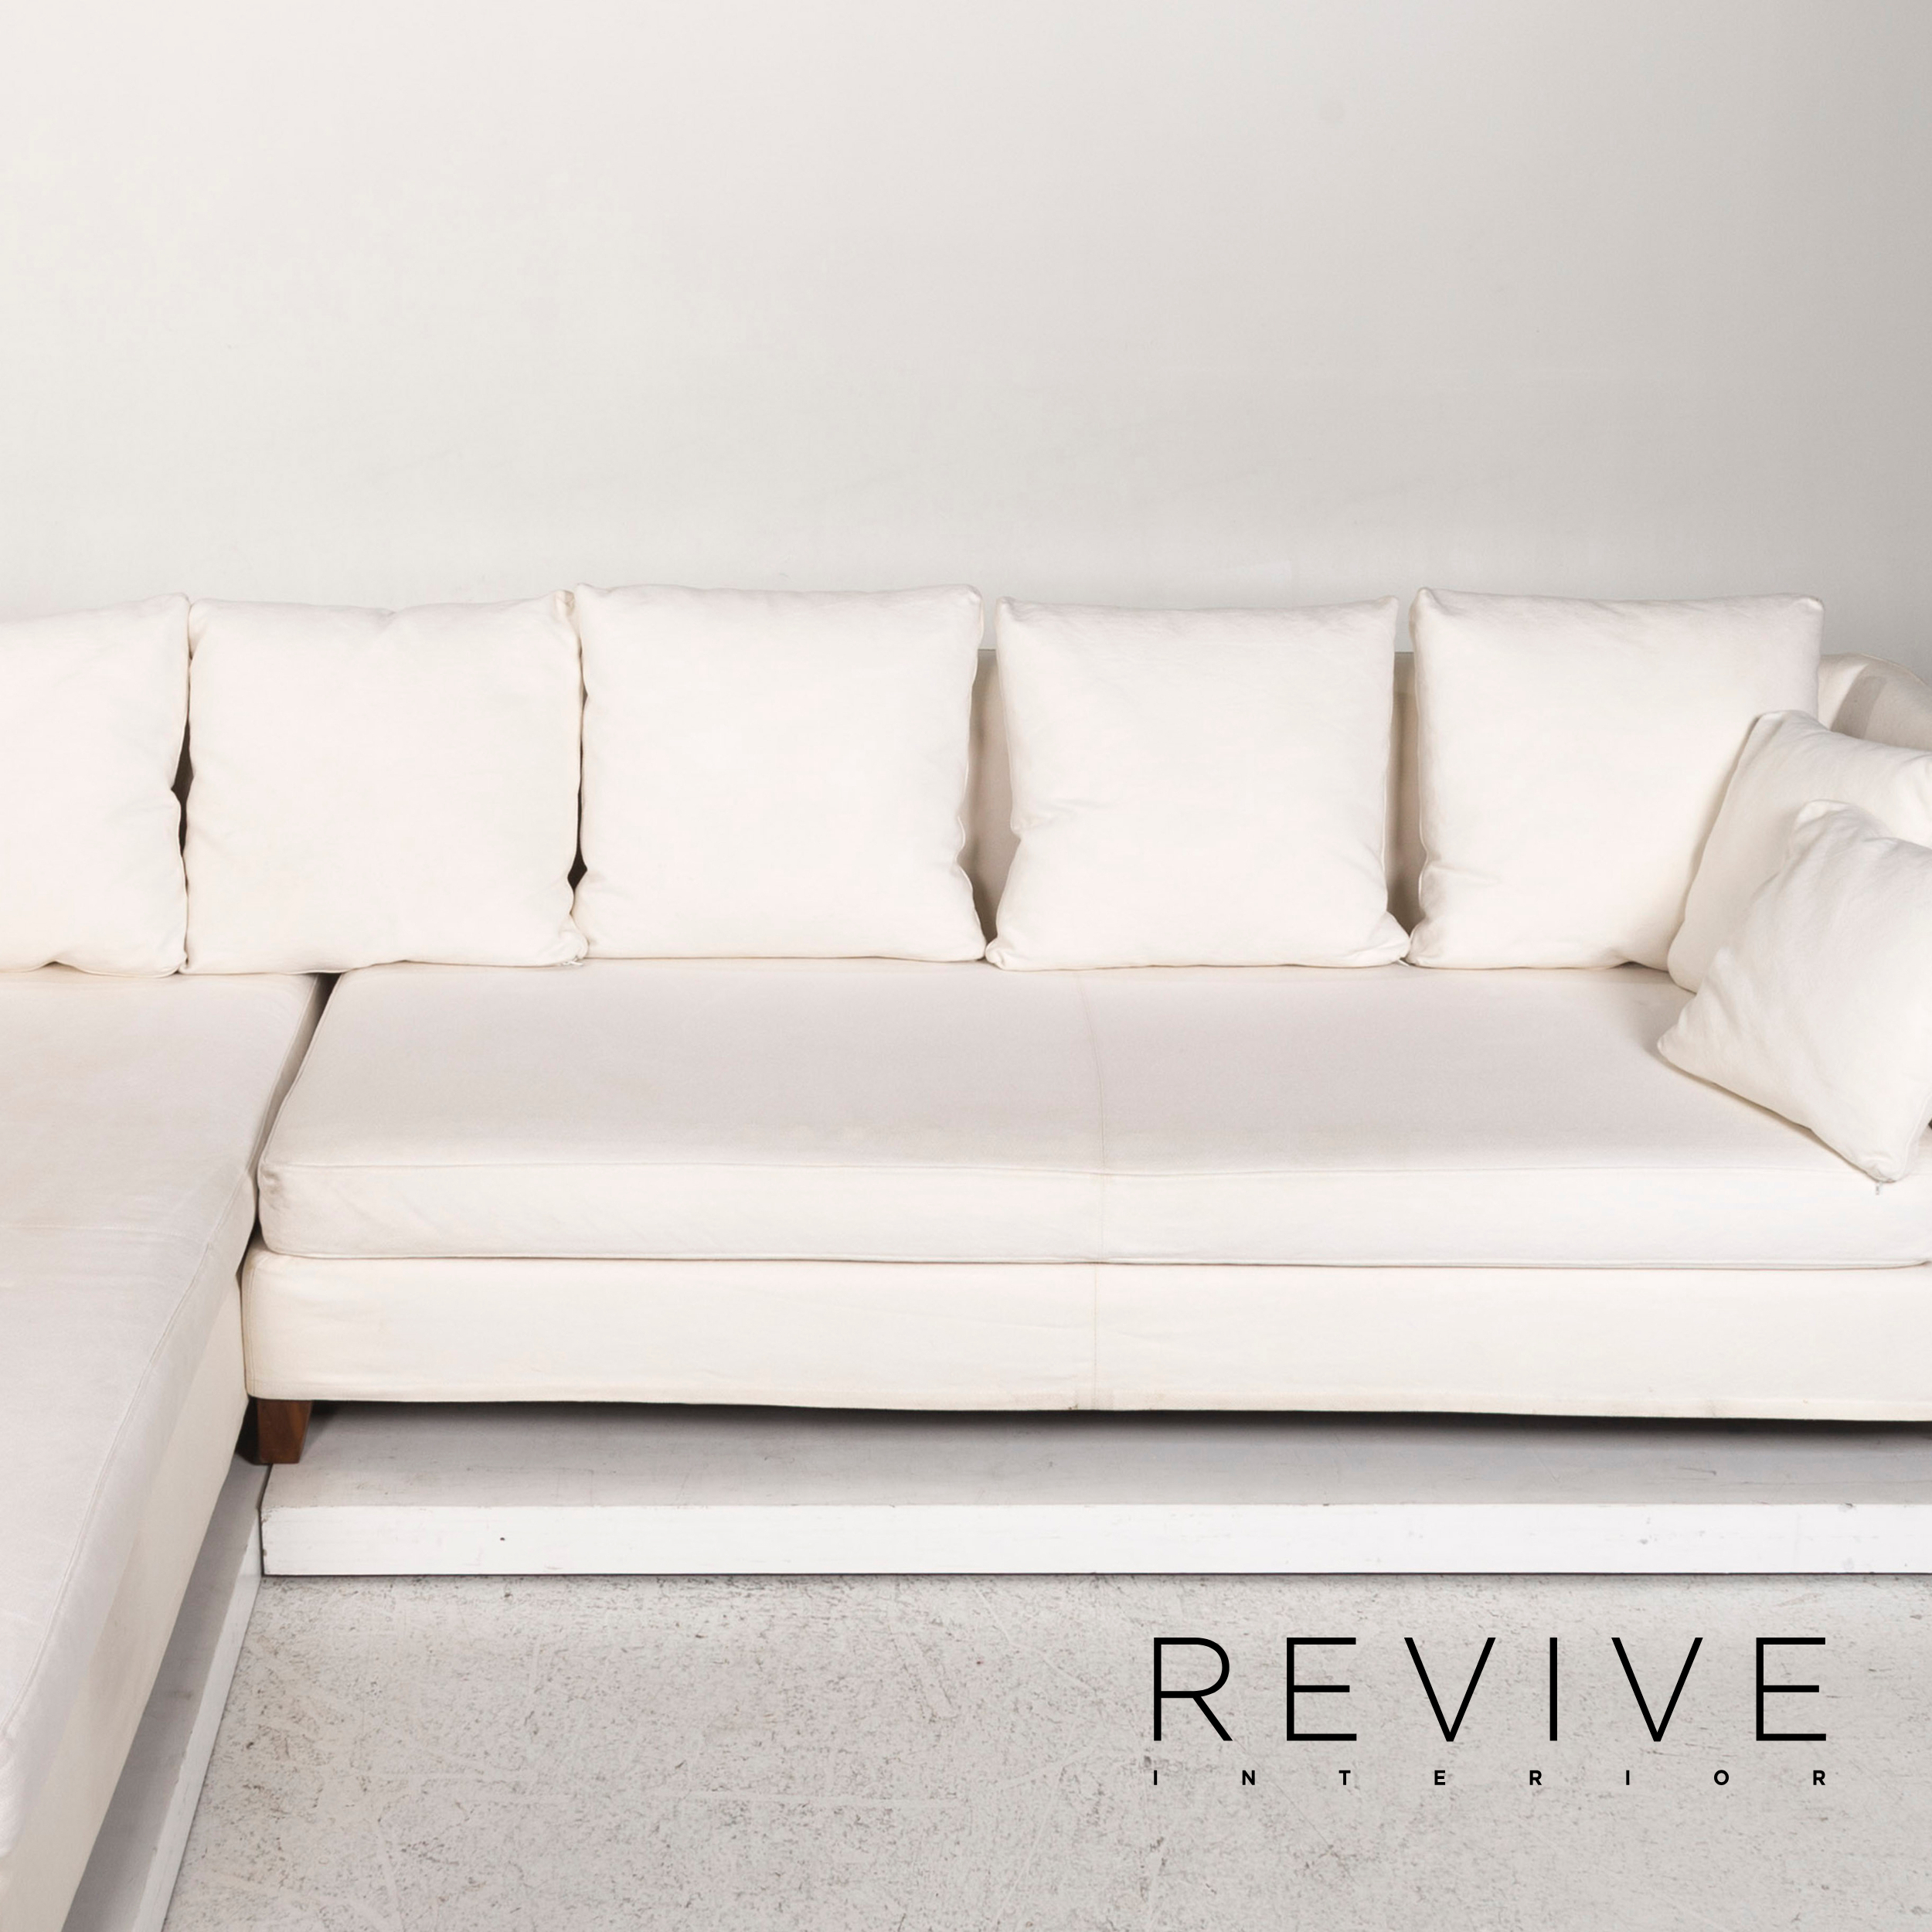 Flexform Stoff Ecksofa Creme Sofa Couch #12465   eBay